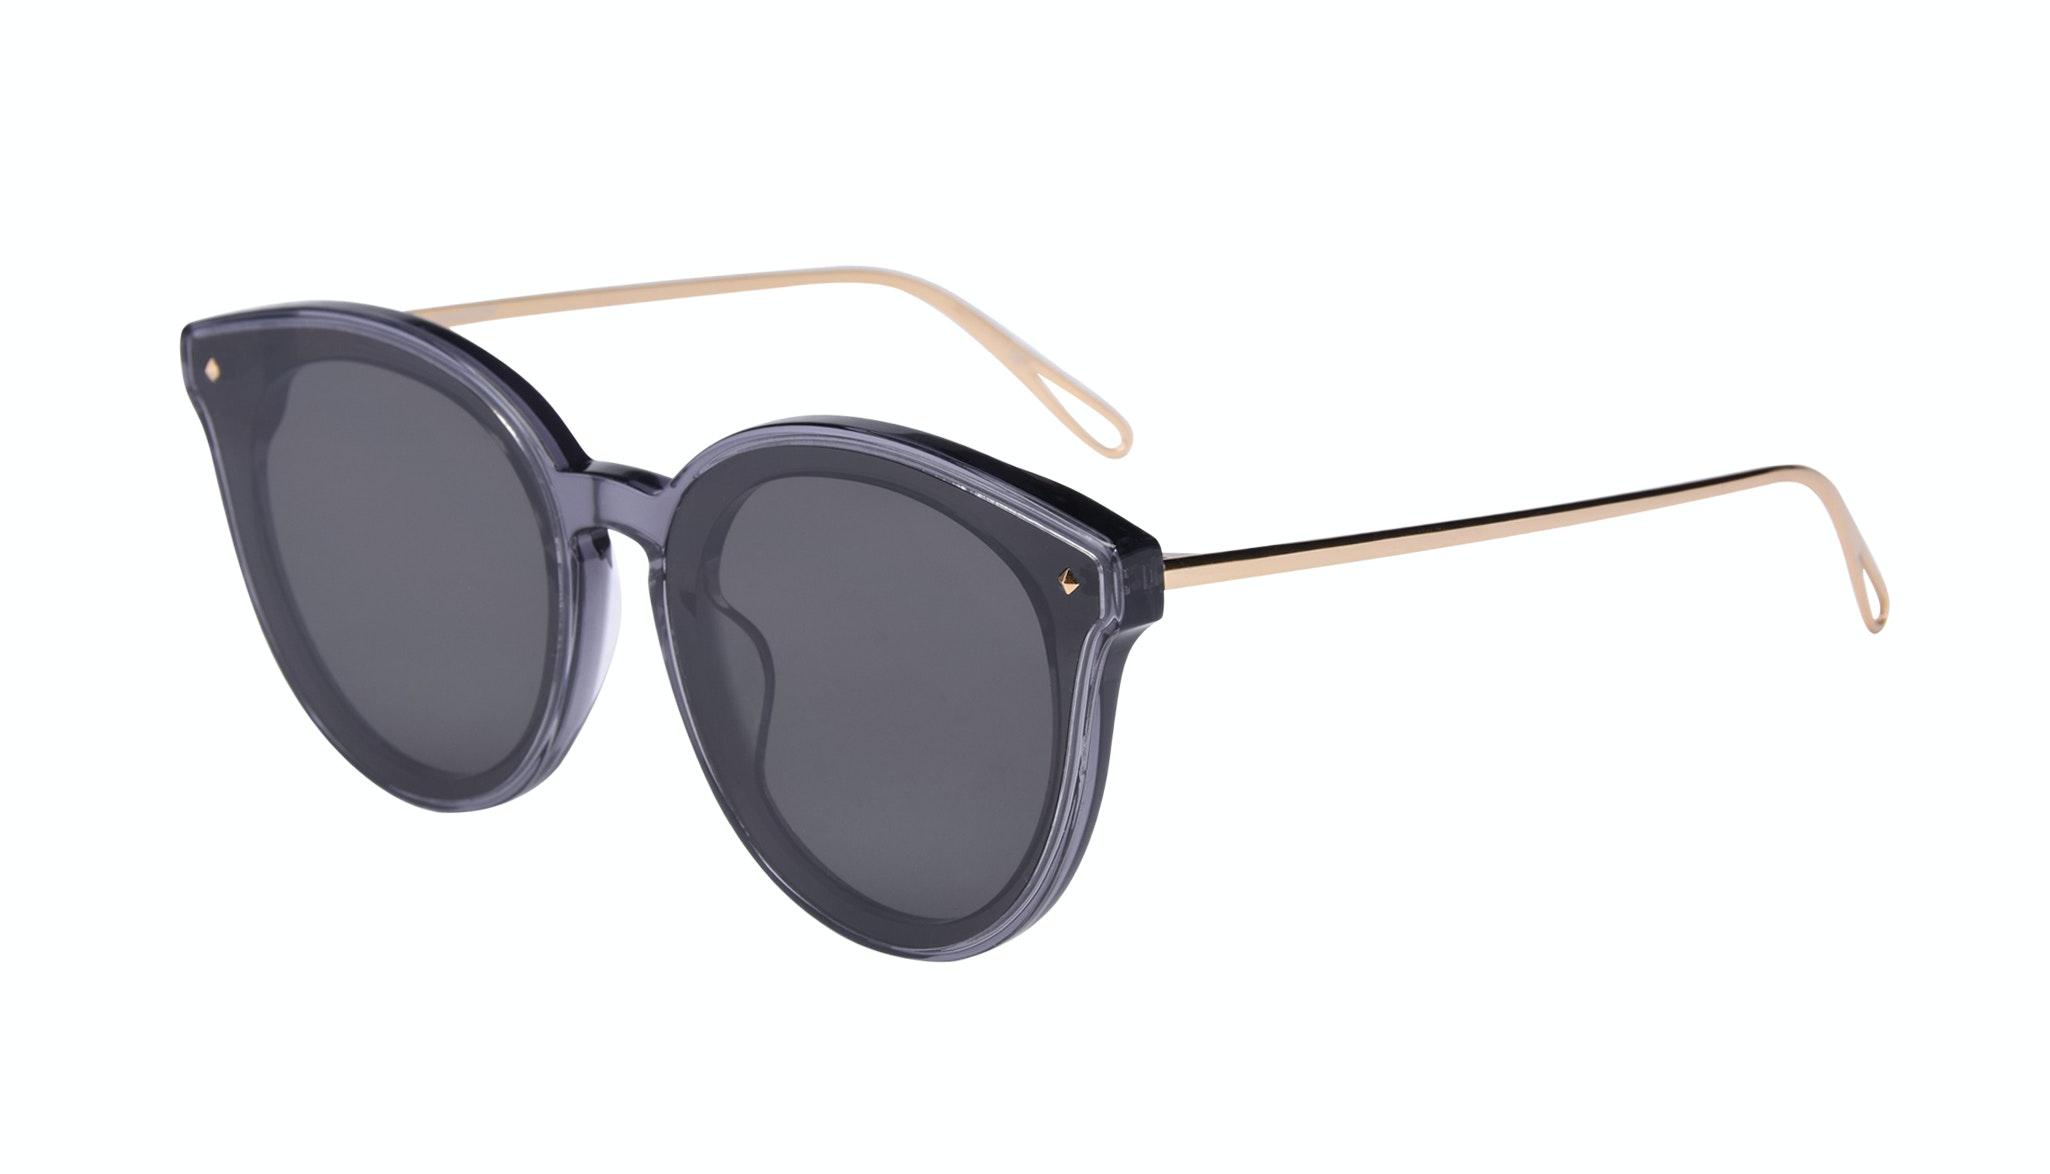 Affordable Fashion Glasses Cat Eye Sunglasses Women Icone Shadow Tilt